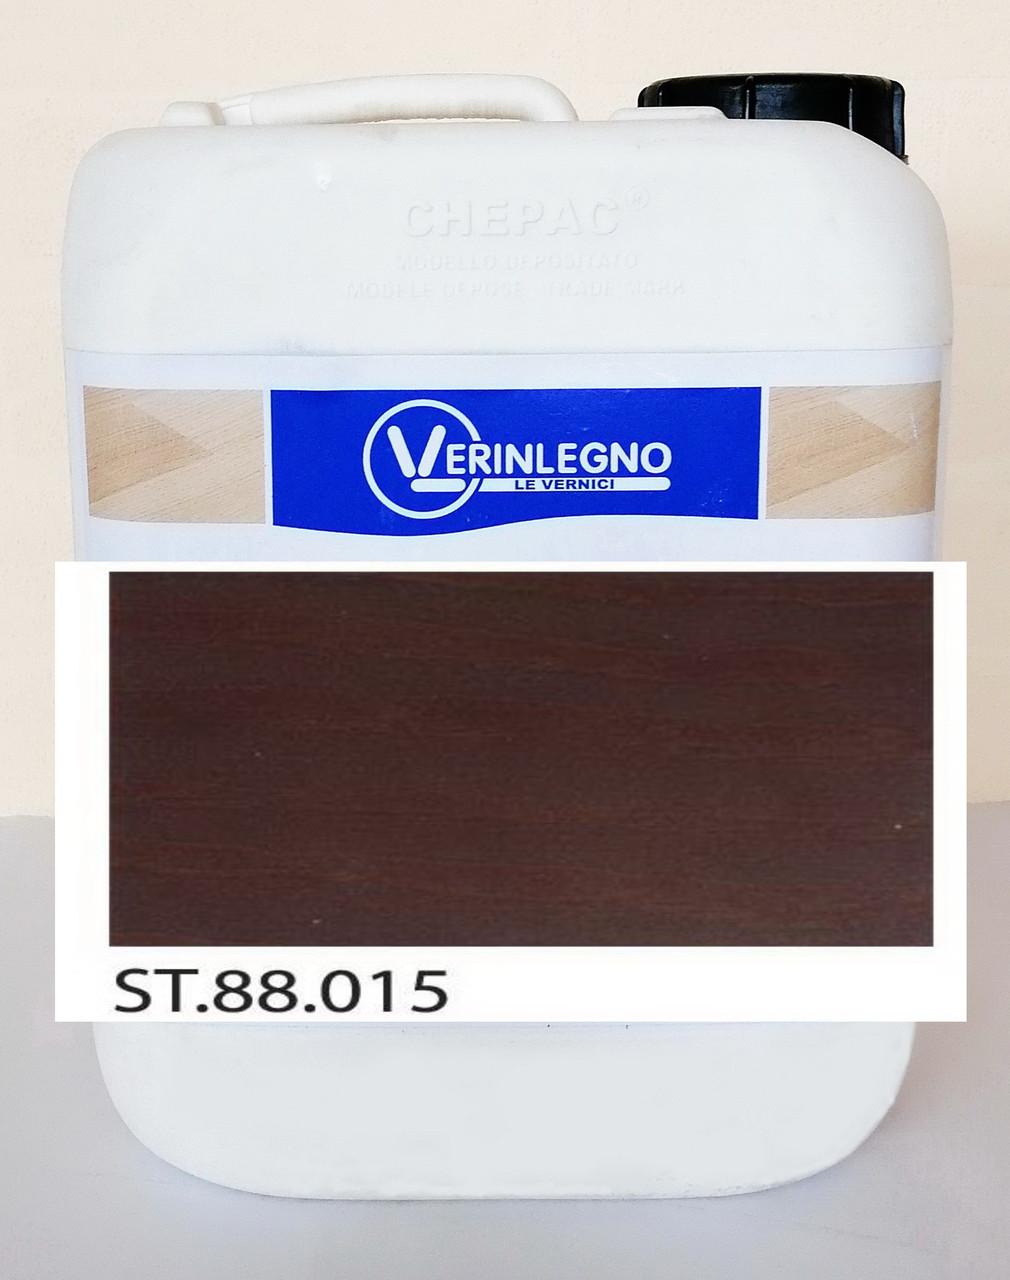 Краситель (морилка, бейц)  для древесины VERINLEGNO ST.88.015, тара: 1л.